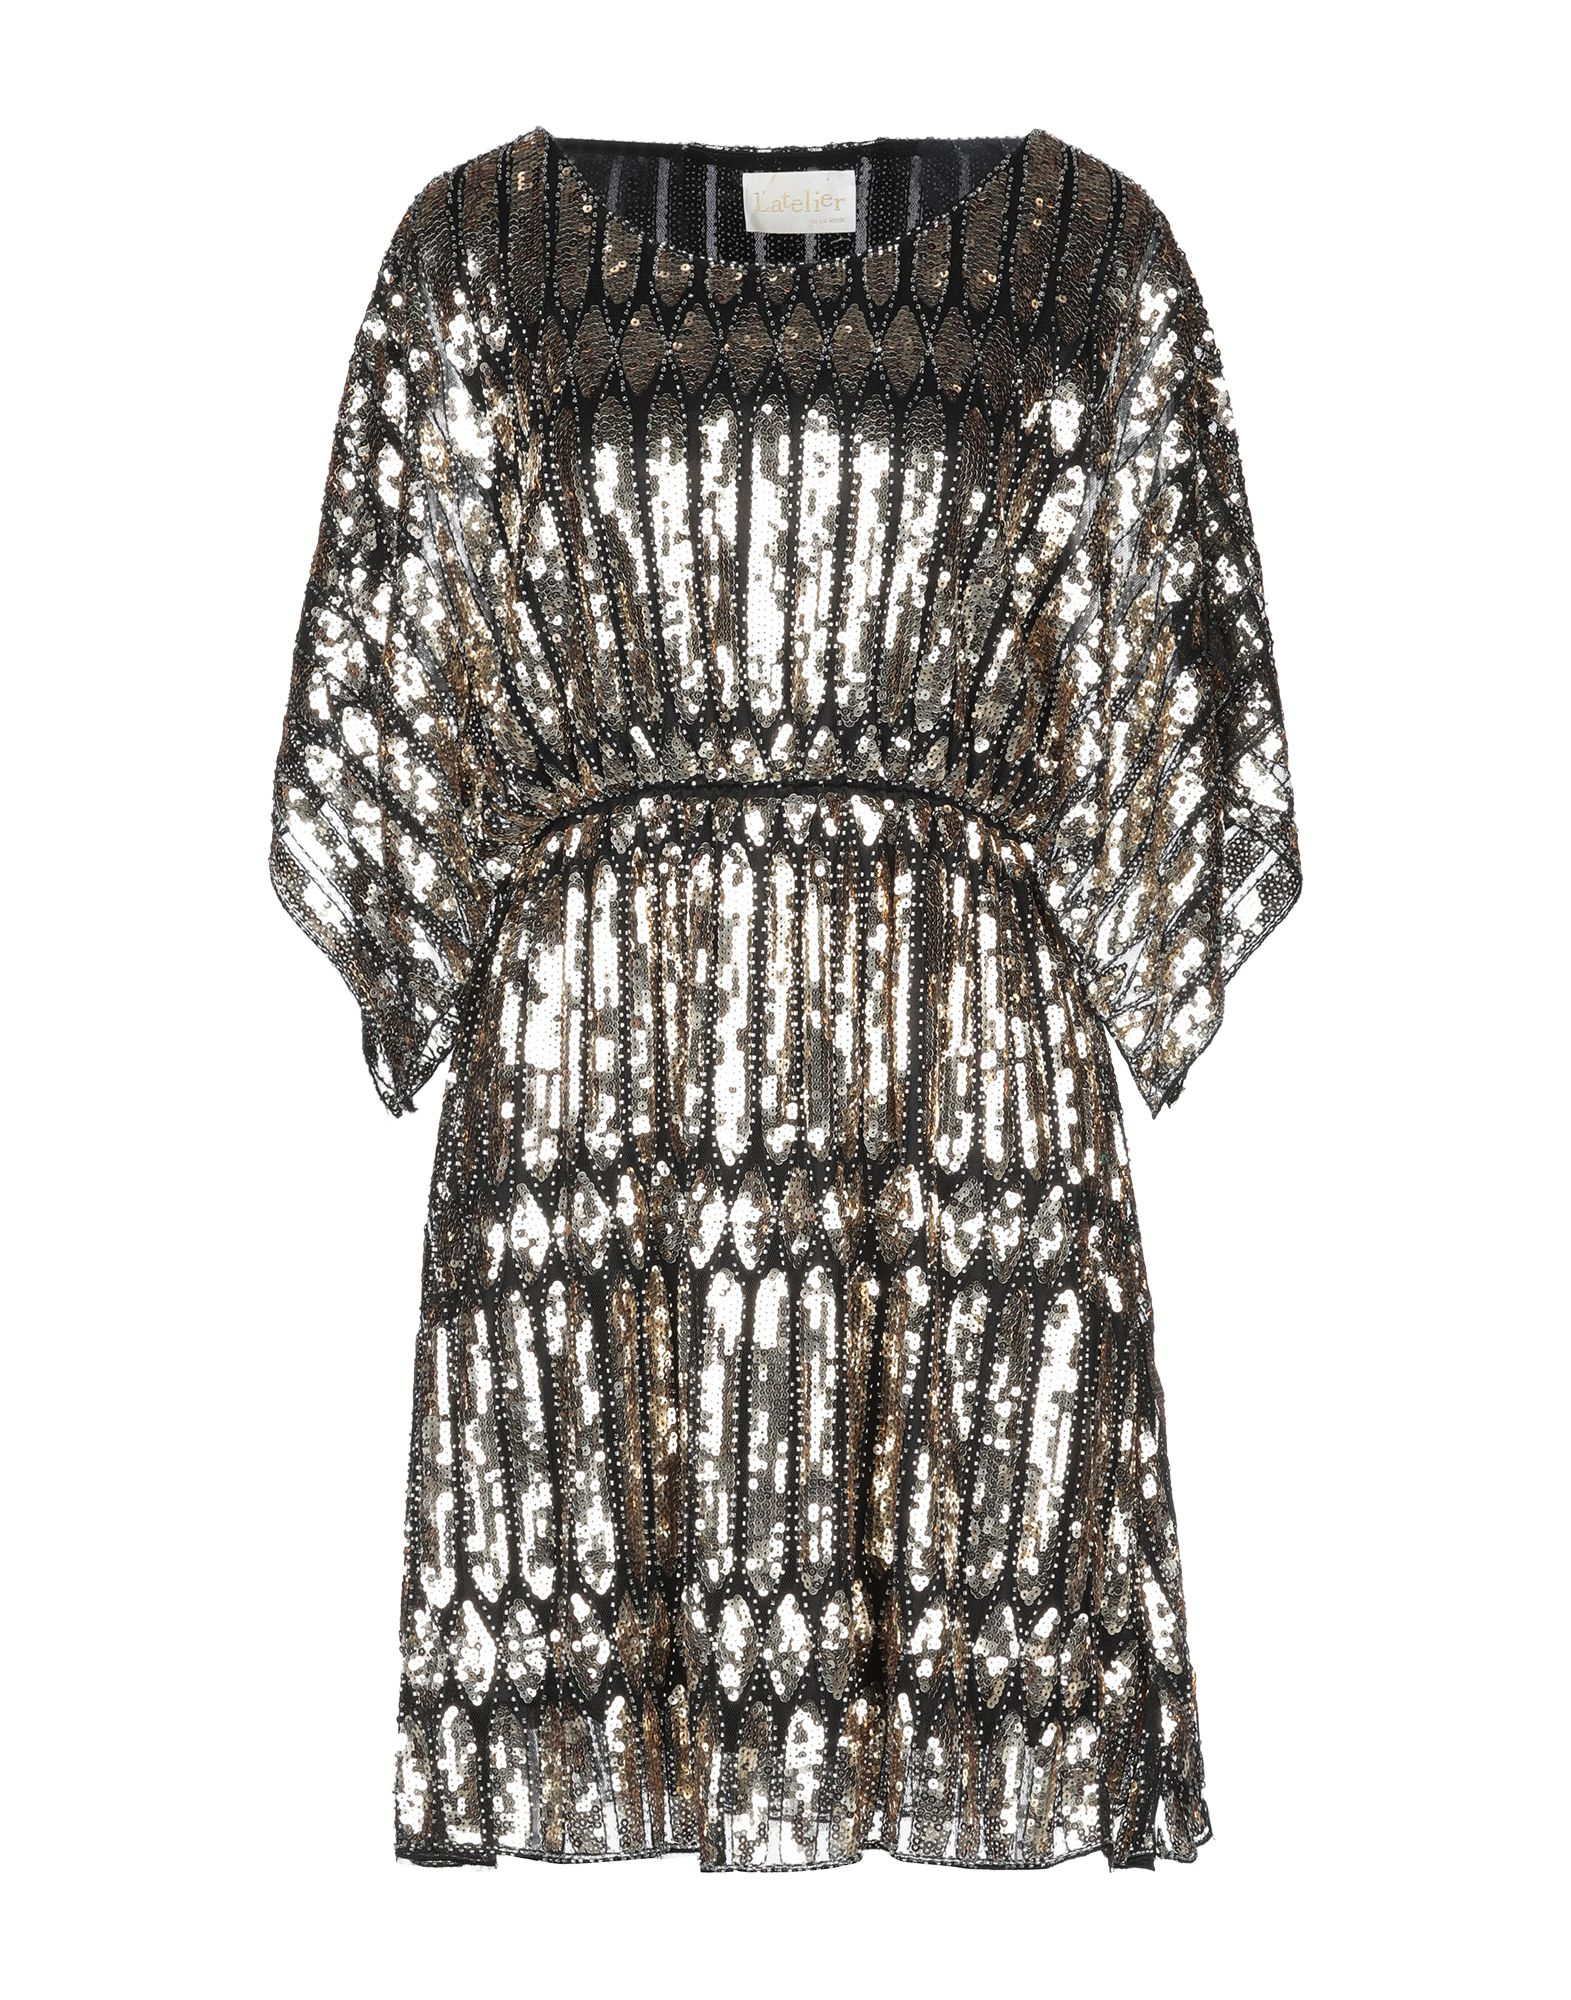 L'ATELIER de La Mode by PATRICIA FORGEAL Платье до колена